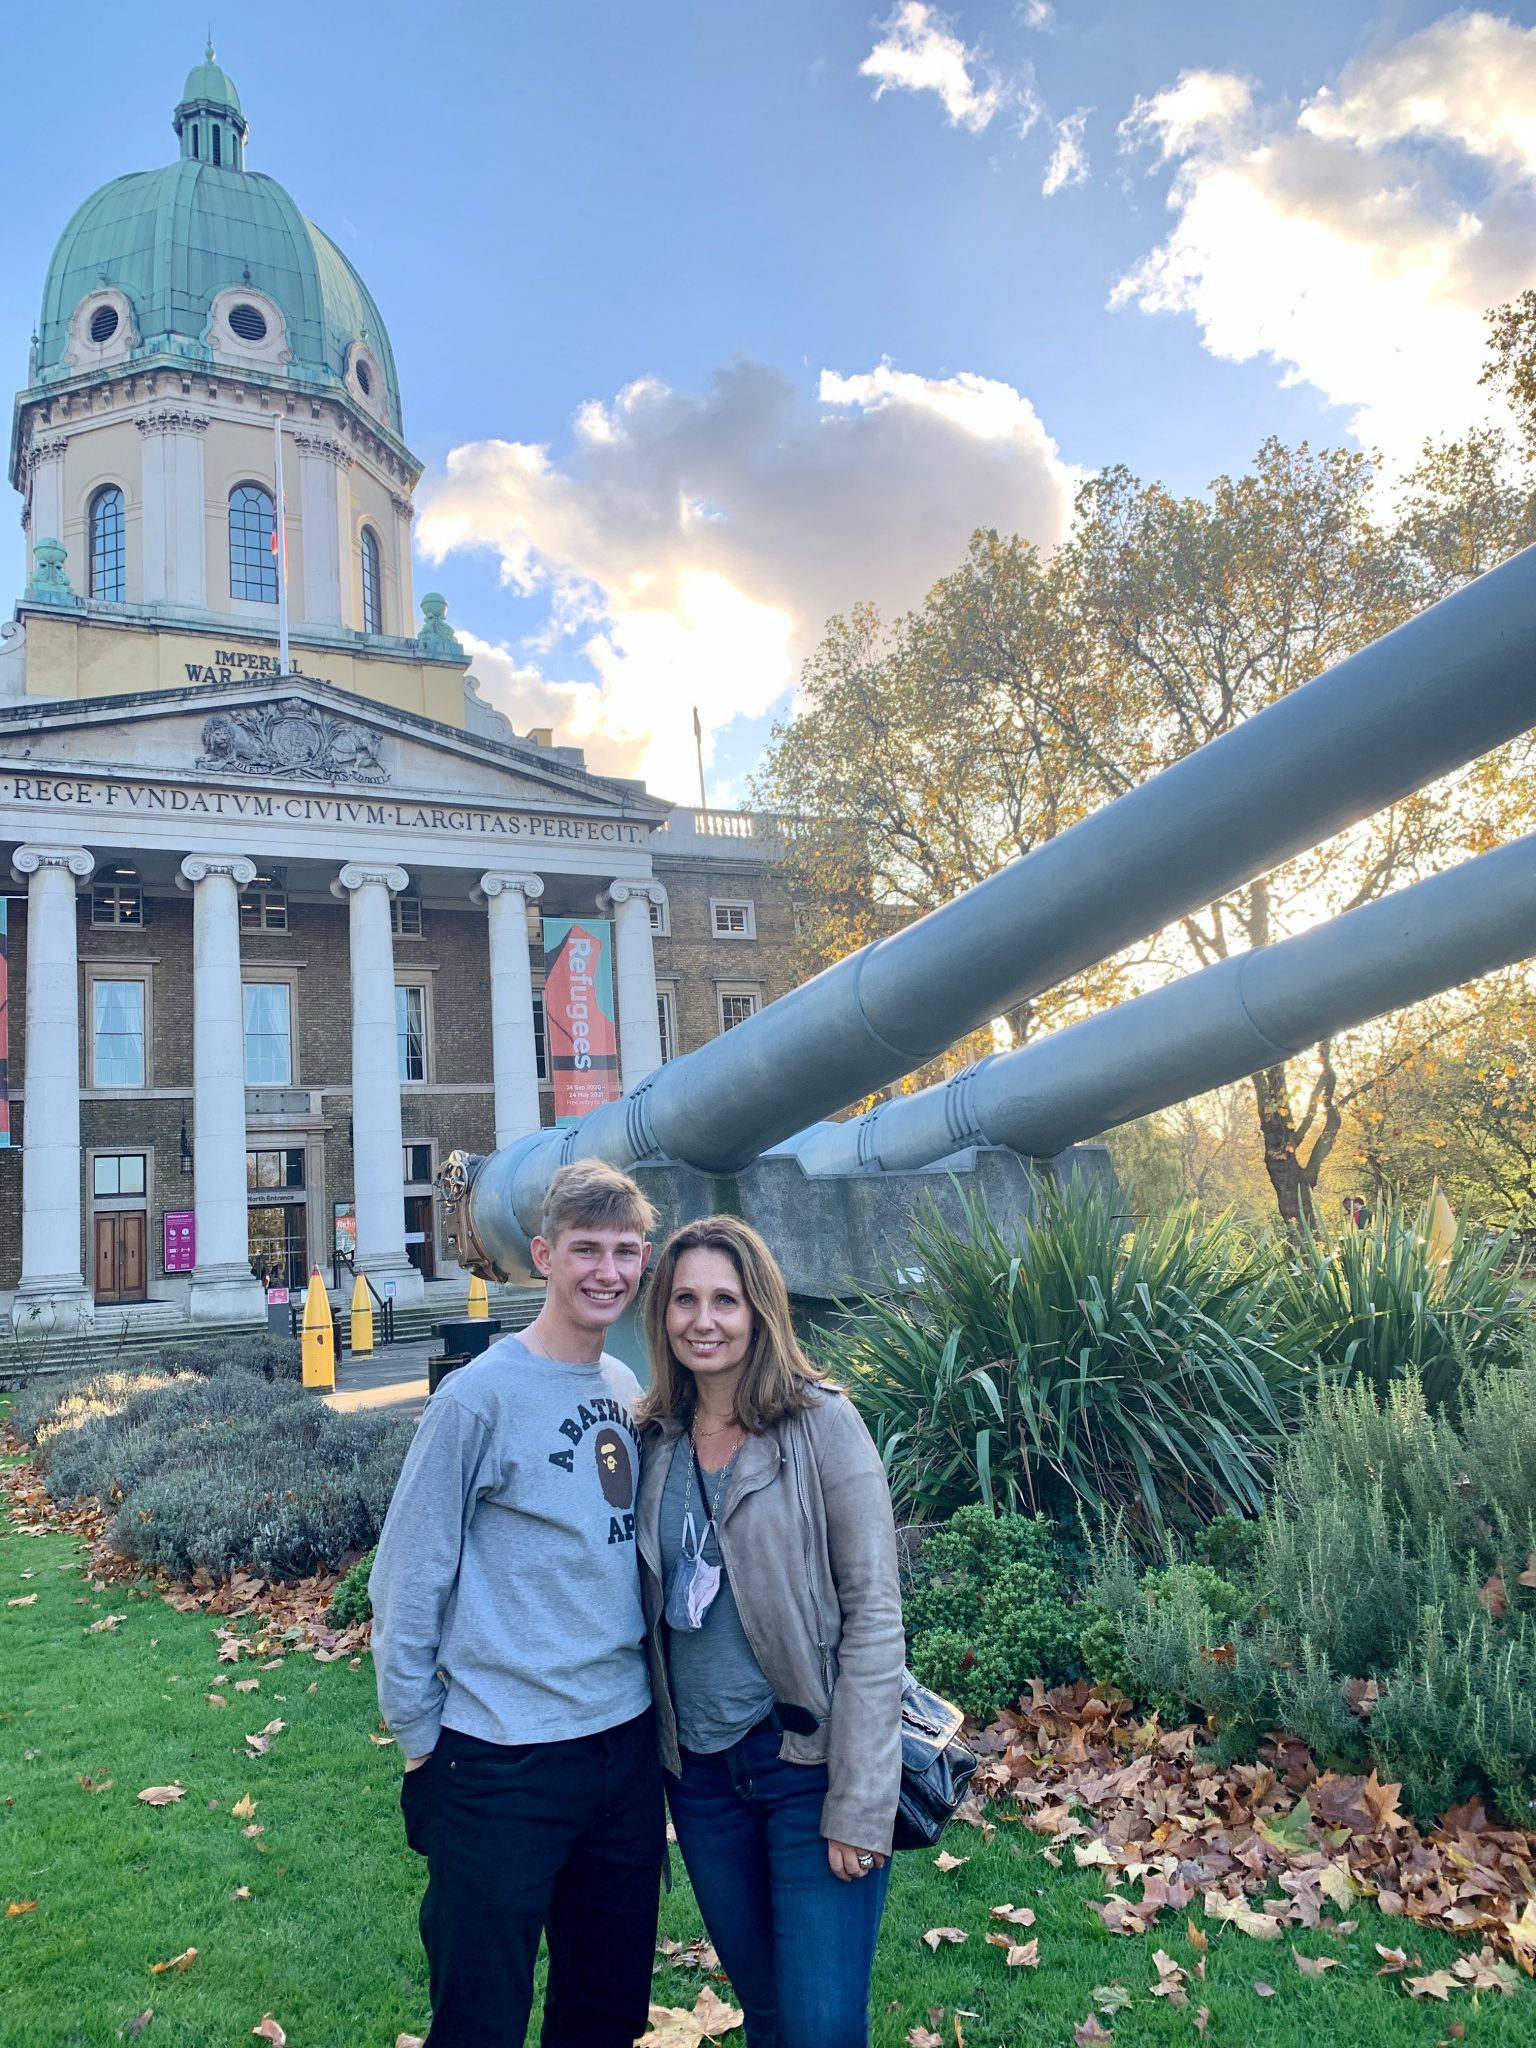 imperial war museum in London